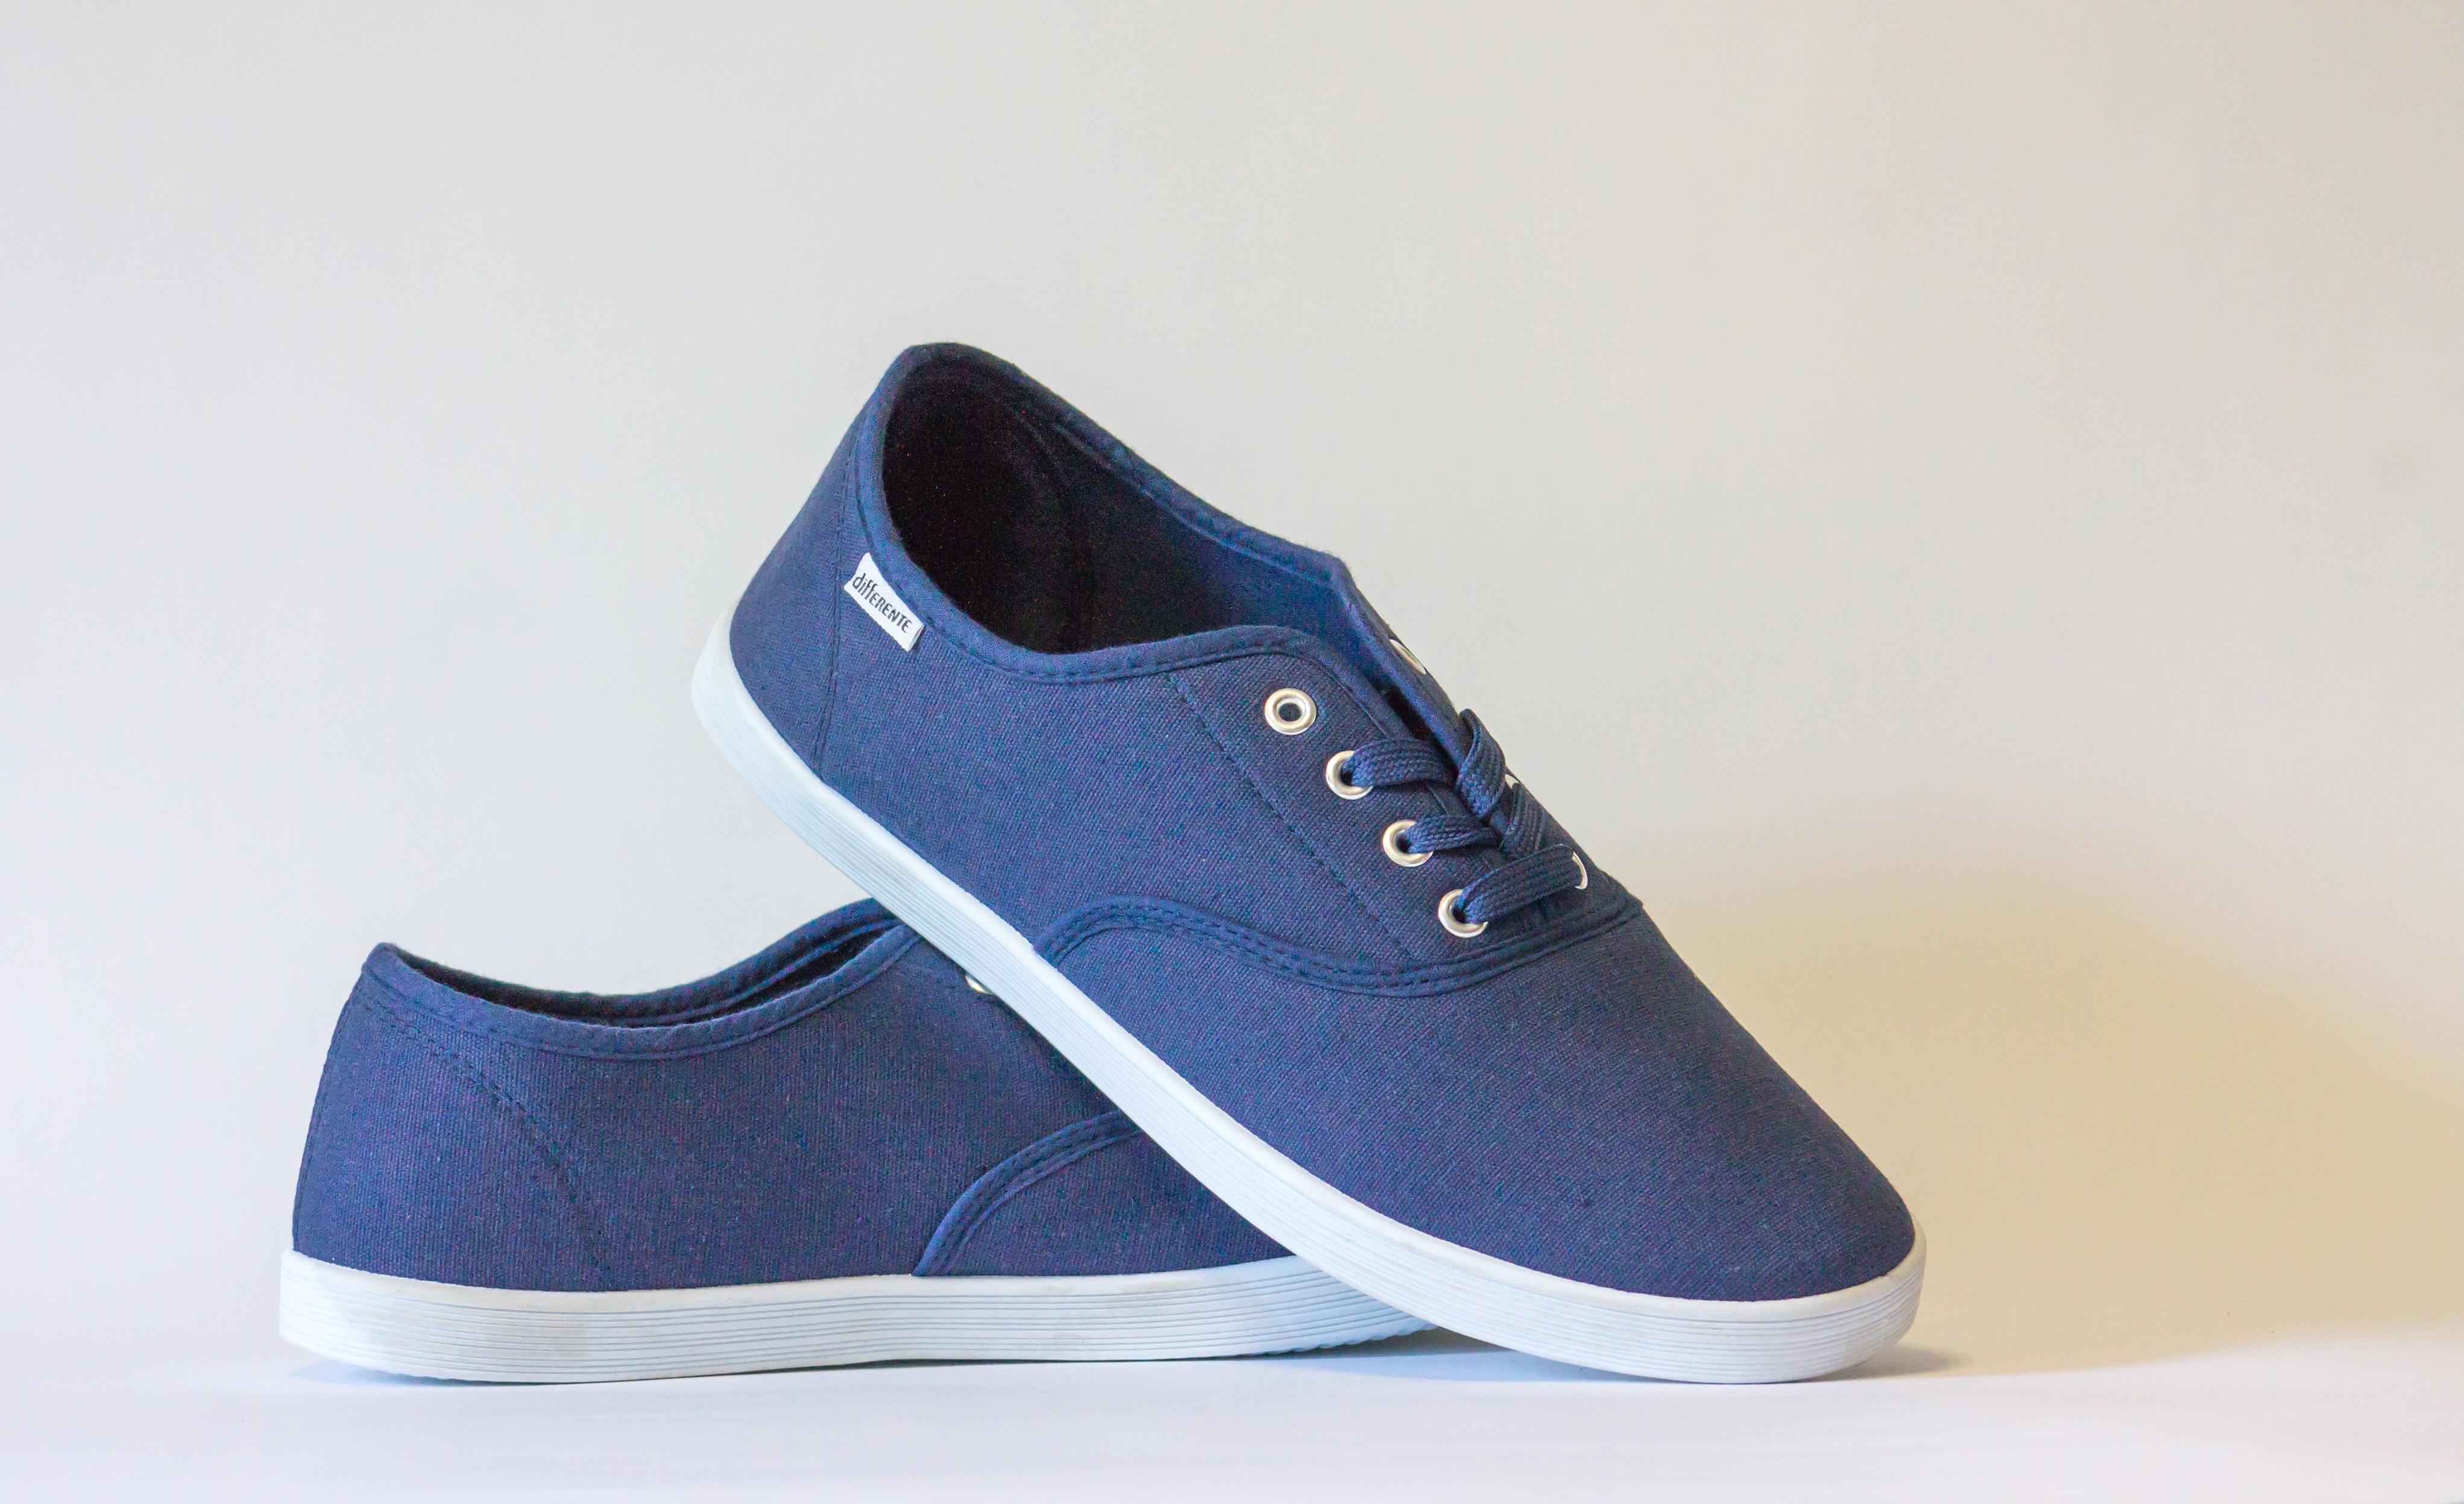 Marque chaussure De Sport Mode Suede Chaussures Ho Ijtn65